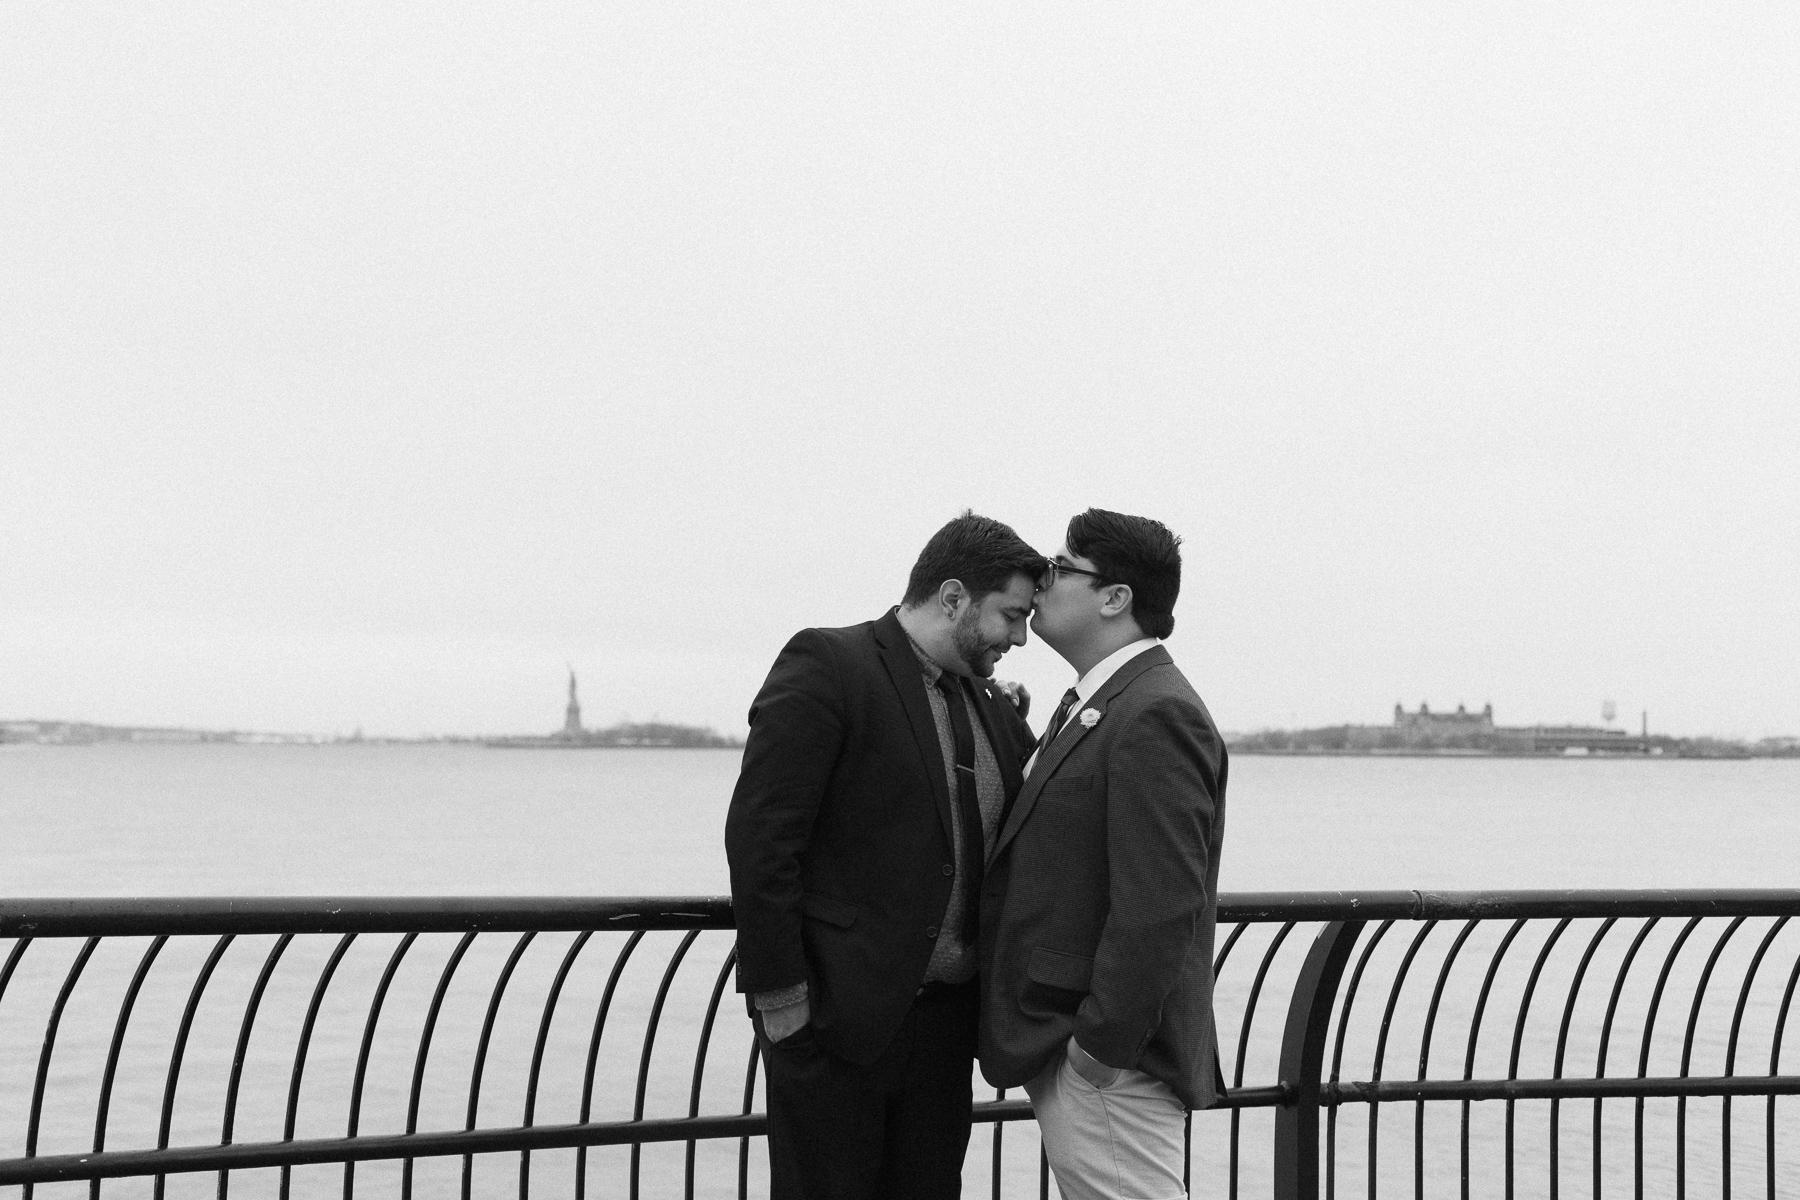 2017_NYC_Wedding_Photographer_Nontraditional_Candid-12.jpg